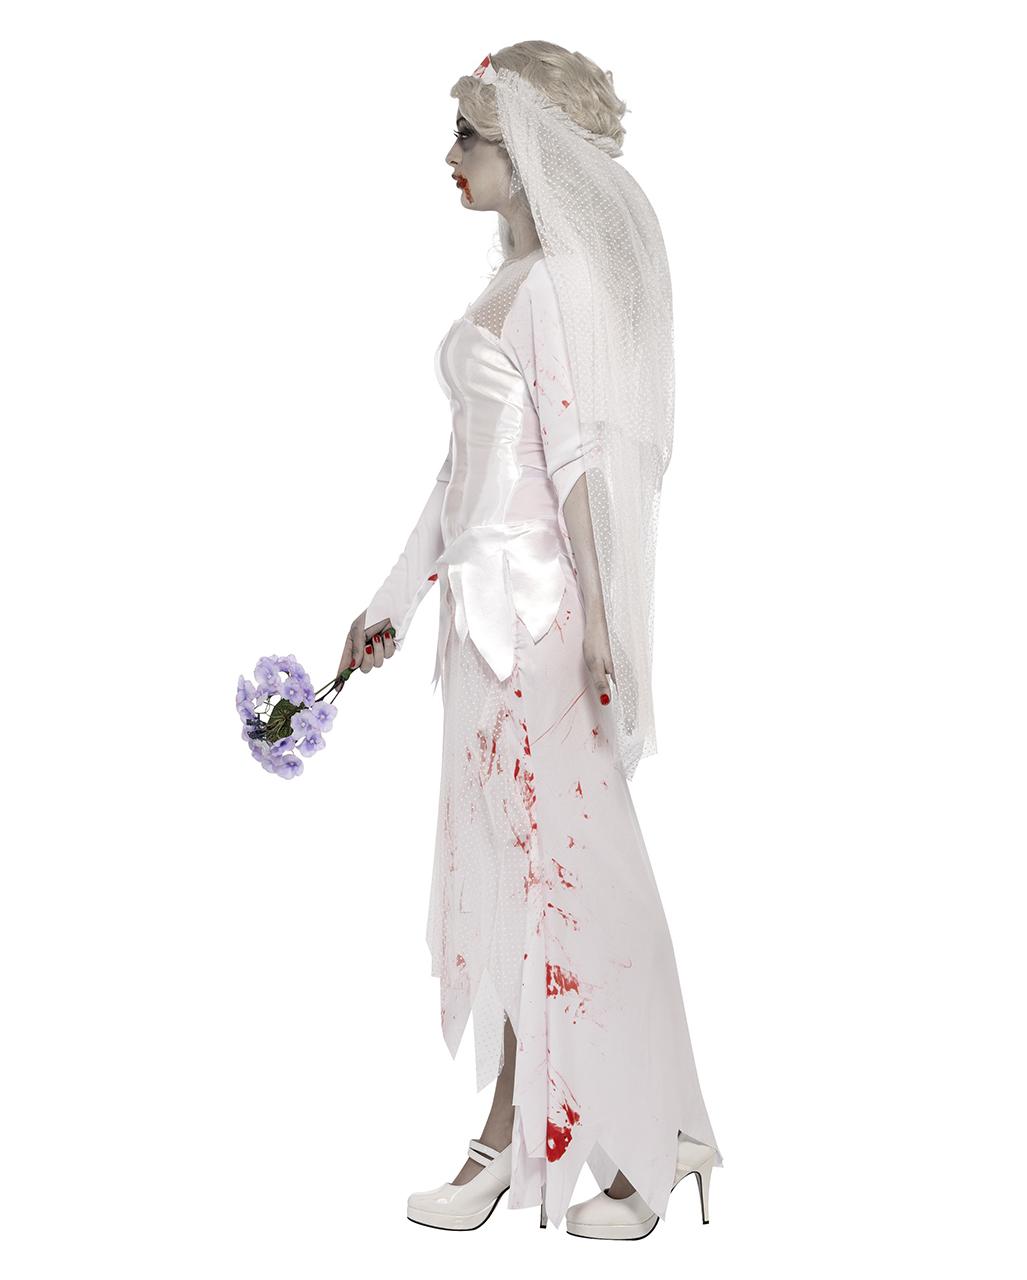 Zombiebraut Kostüm | Blutverschmiertes Hochzeitskleid | Horror-Shop.com